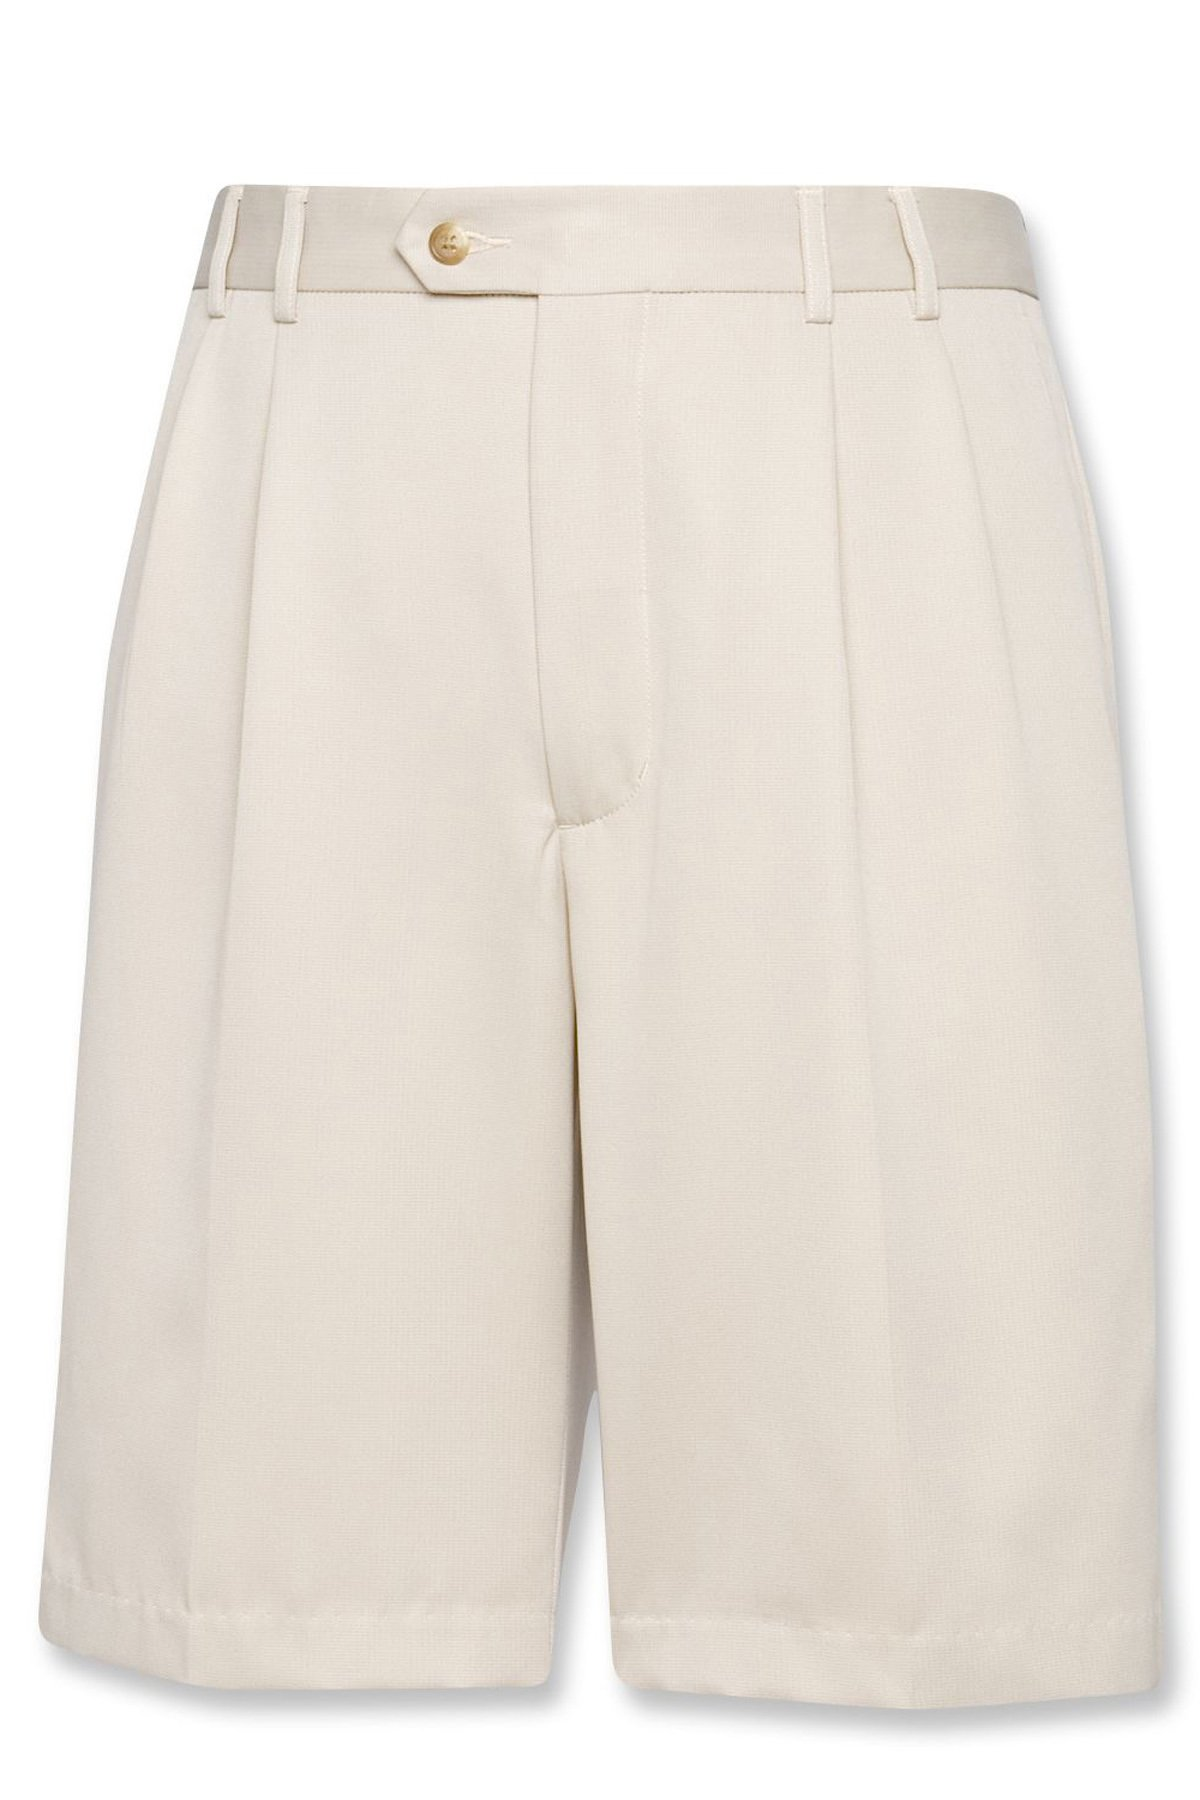 Cutter & Buck MCB09753 Men's Cocona CB DryTec Luxe Short, Dune - 42